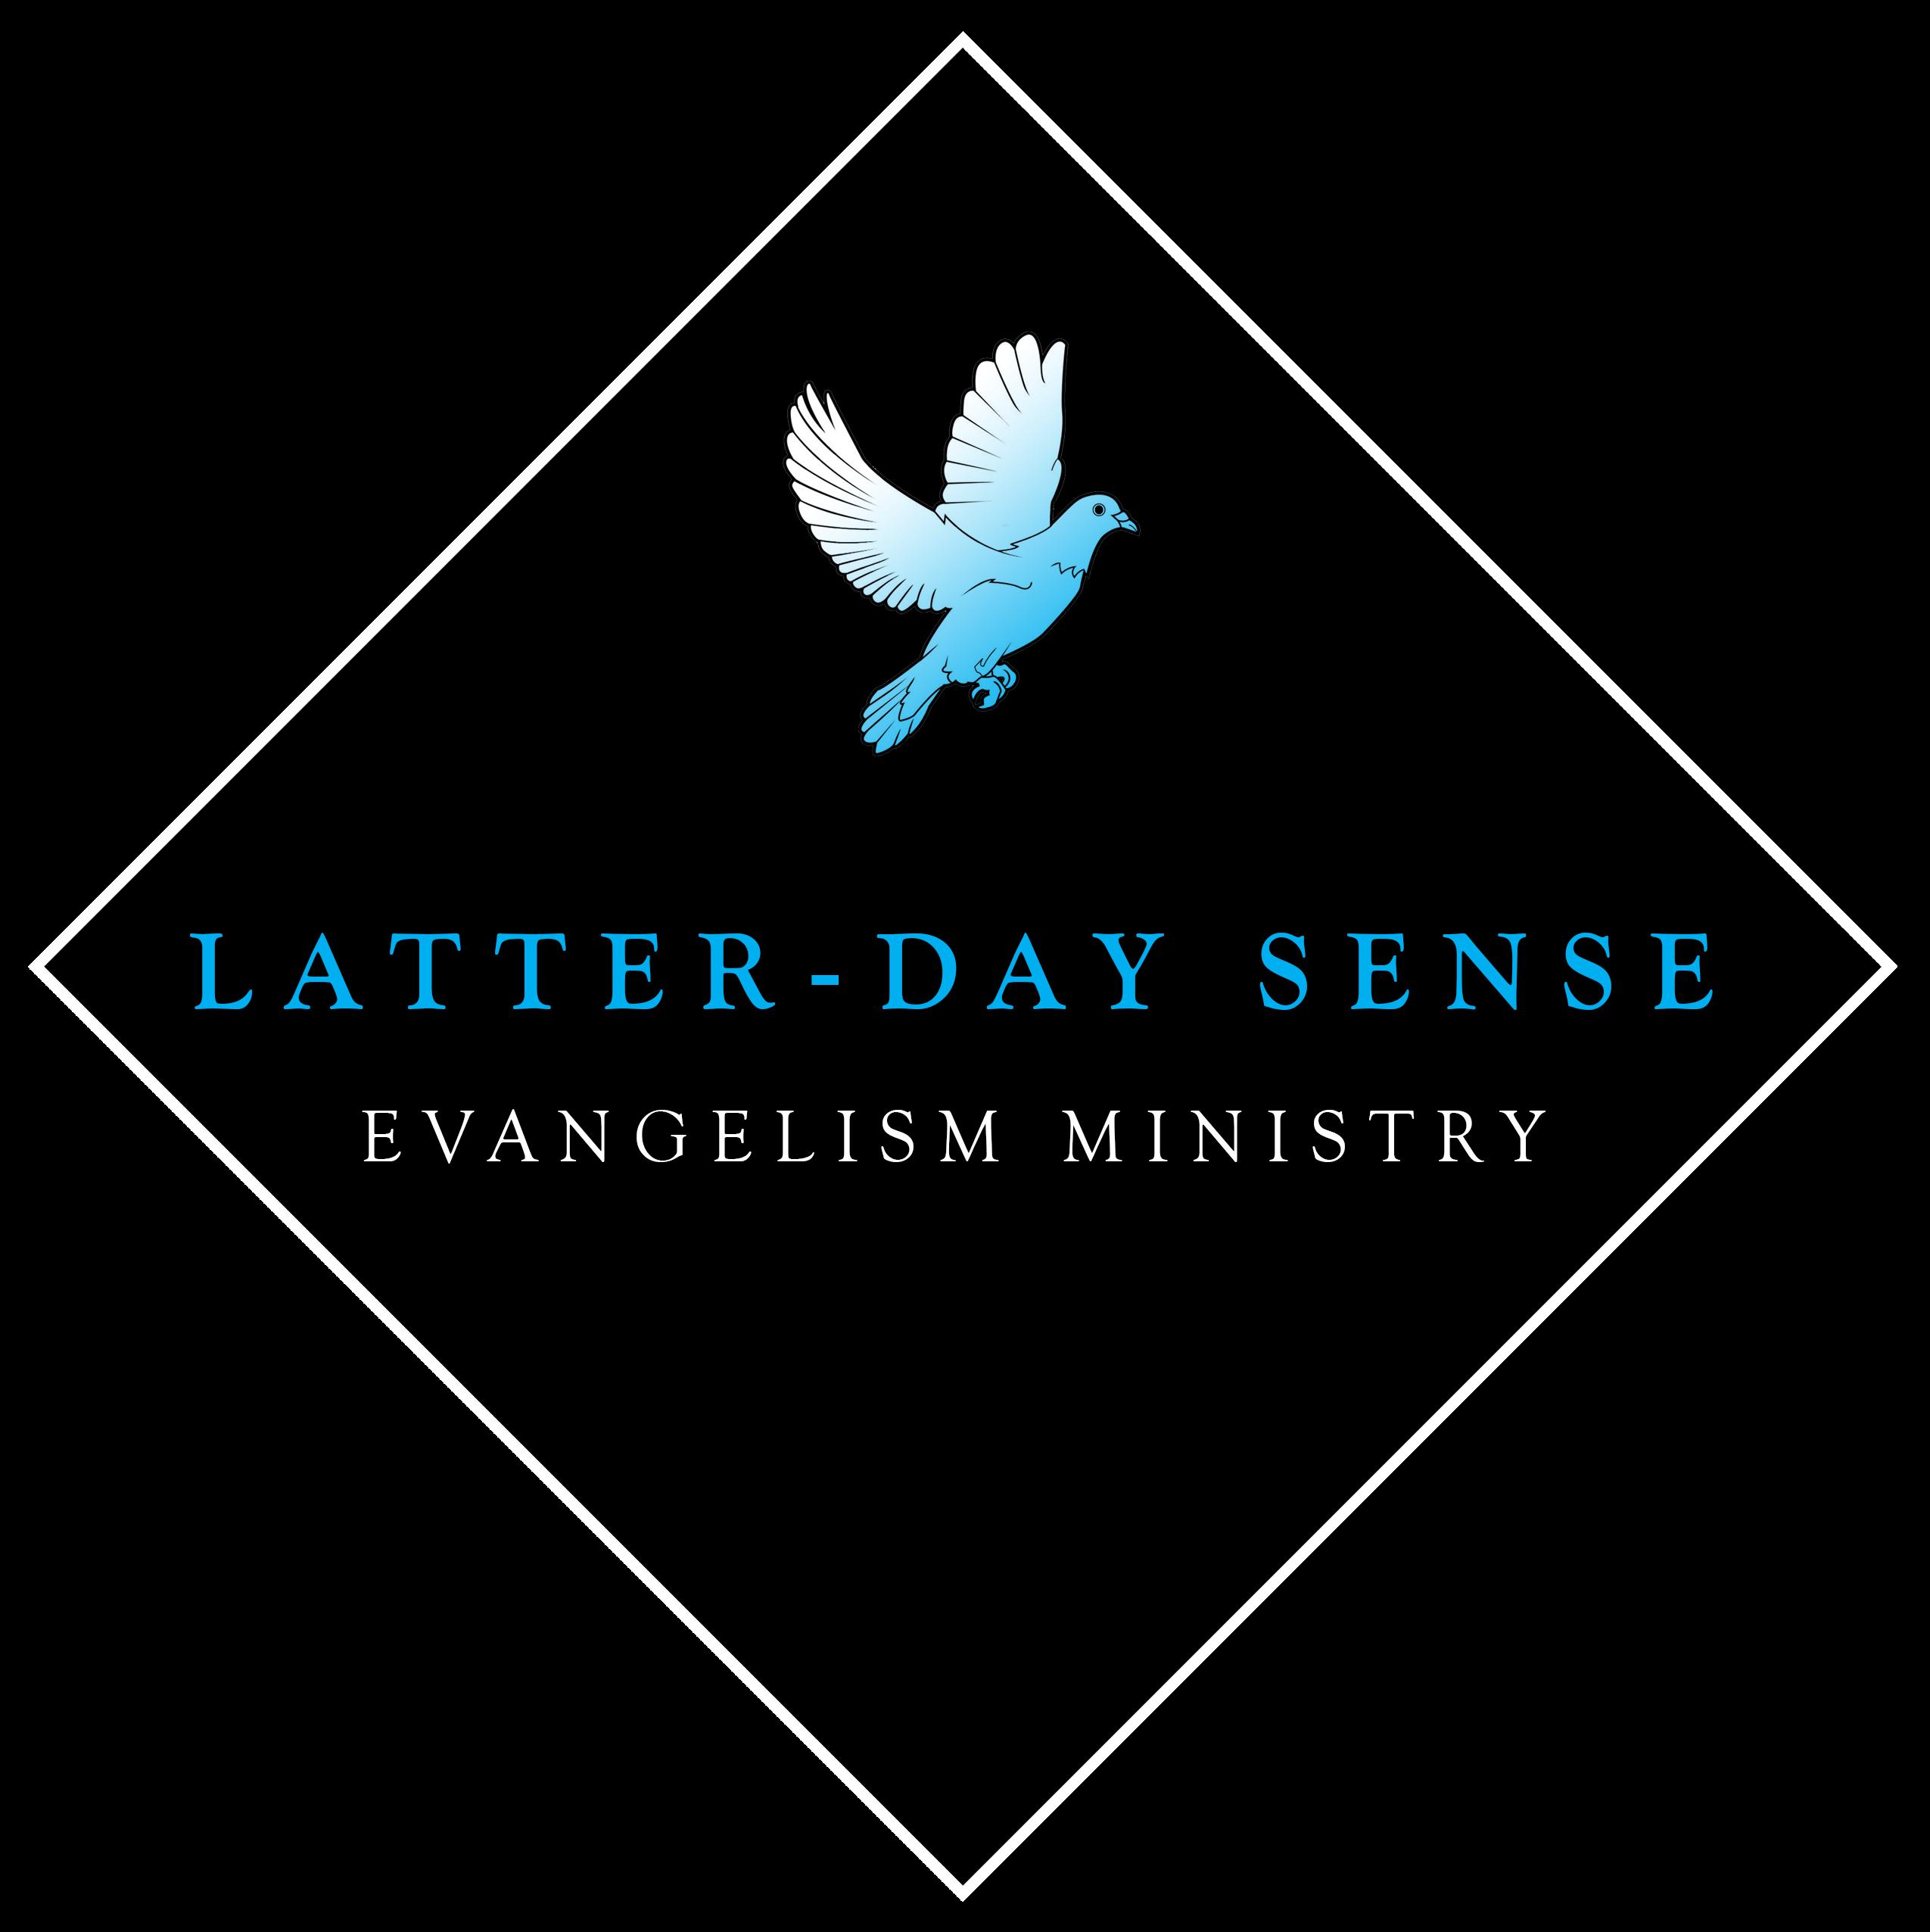 Latter-Day Sense Evangelism Ministry